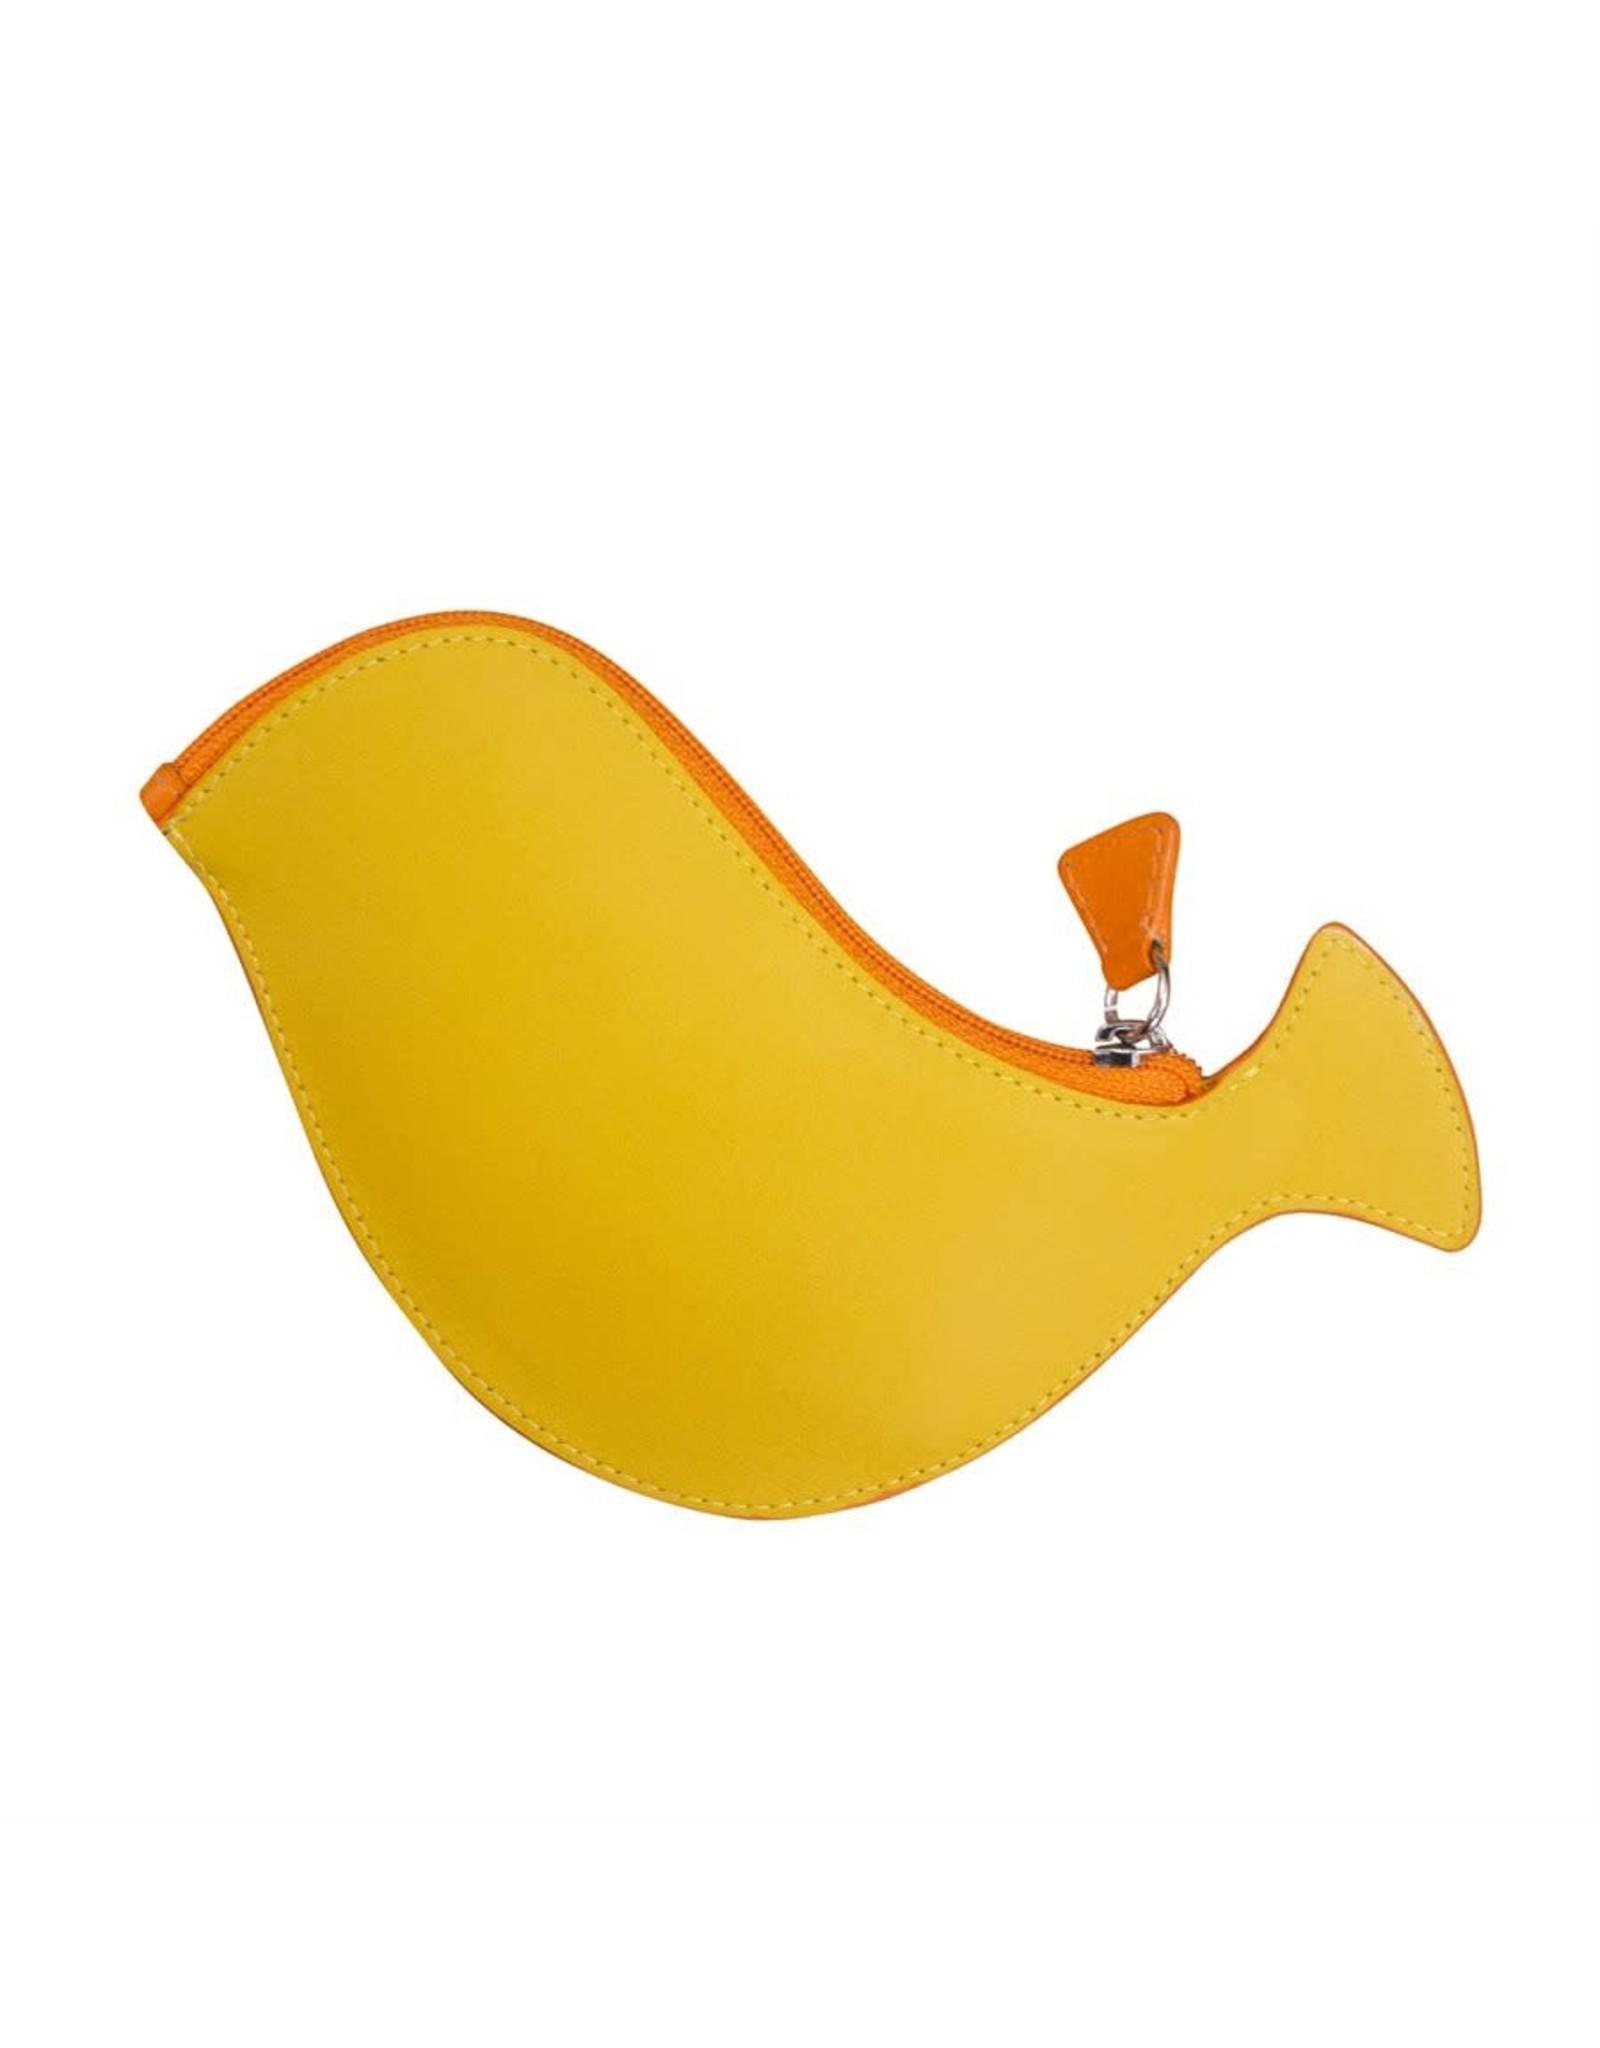 Leather Handbags and Accessories 6455 Papaya - Bird Coin Purse